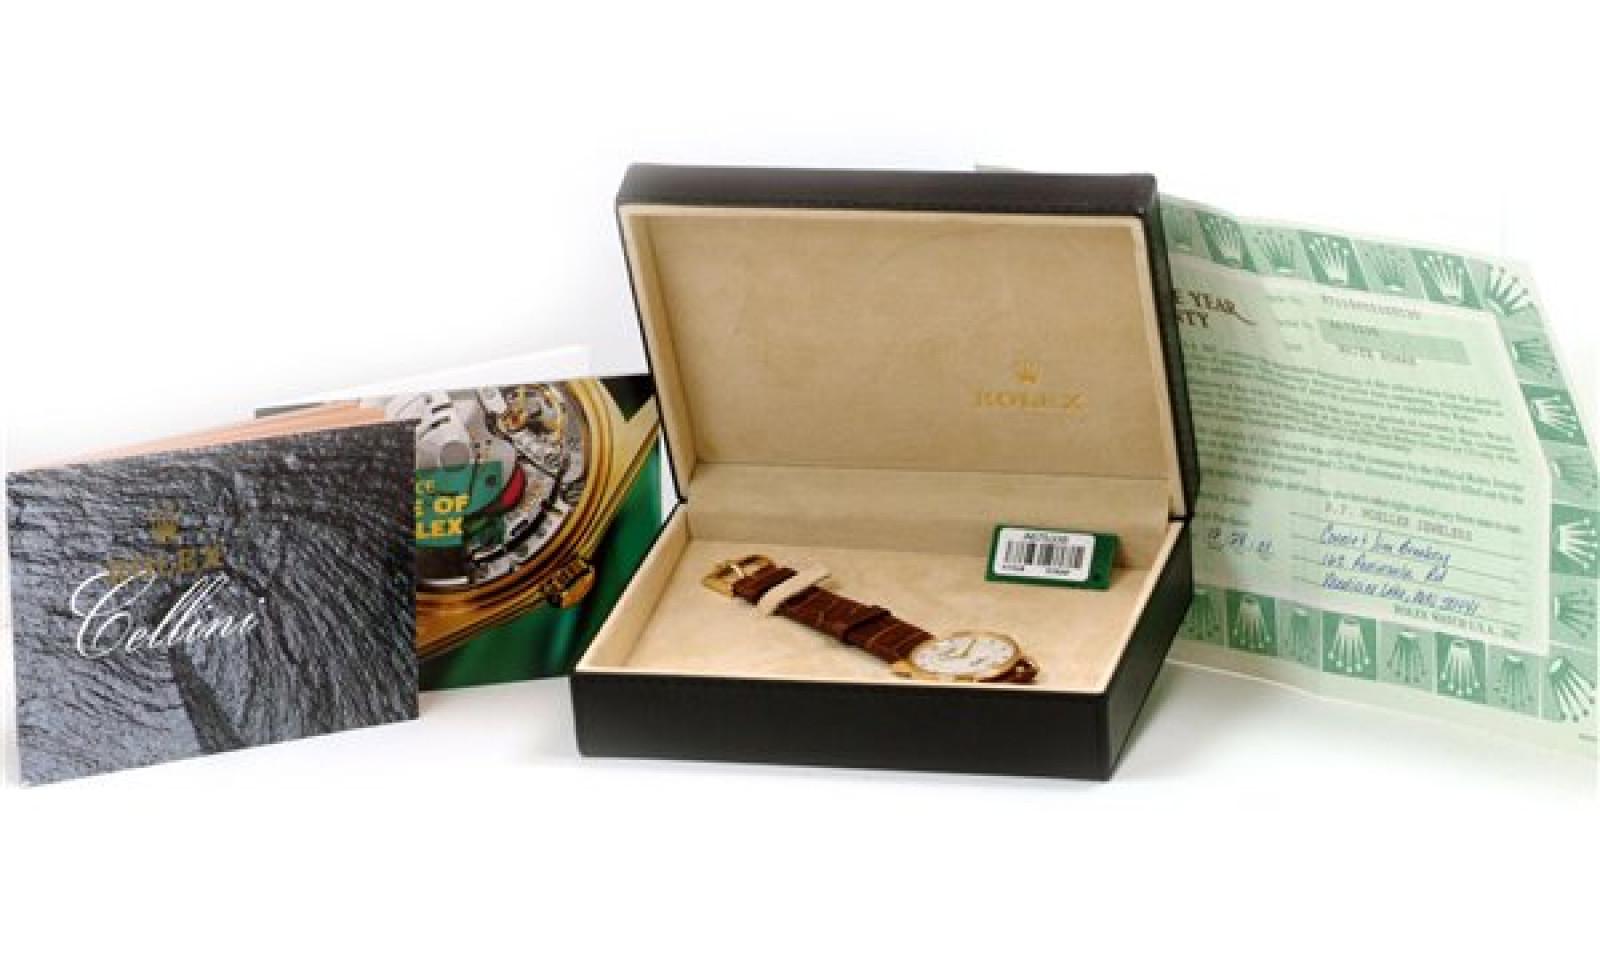 Rolex Cellini 5115 Gold Year 2001